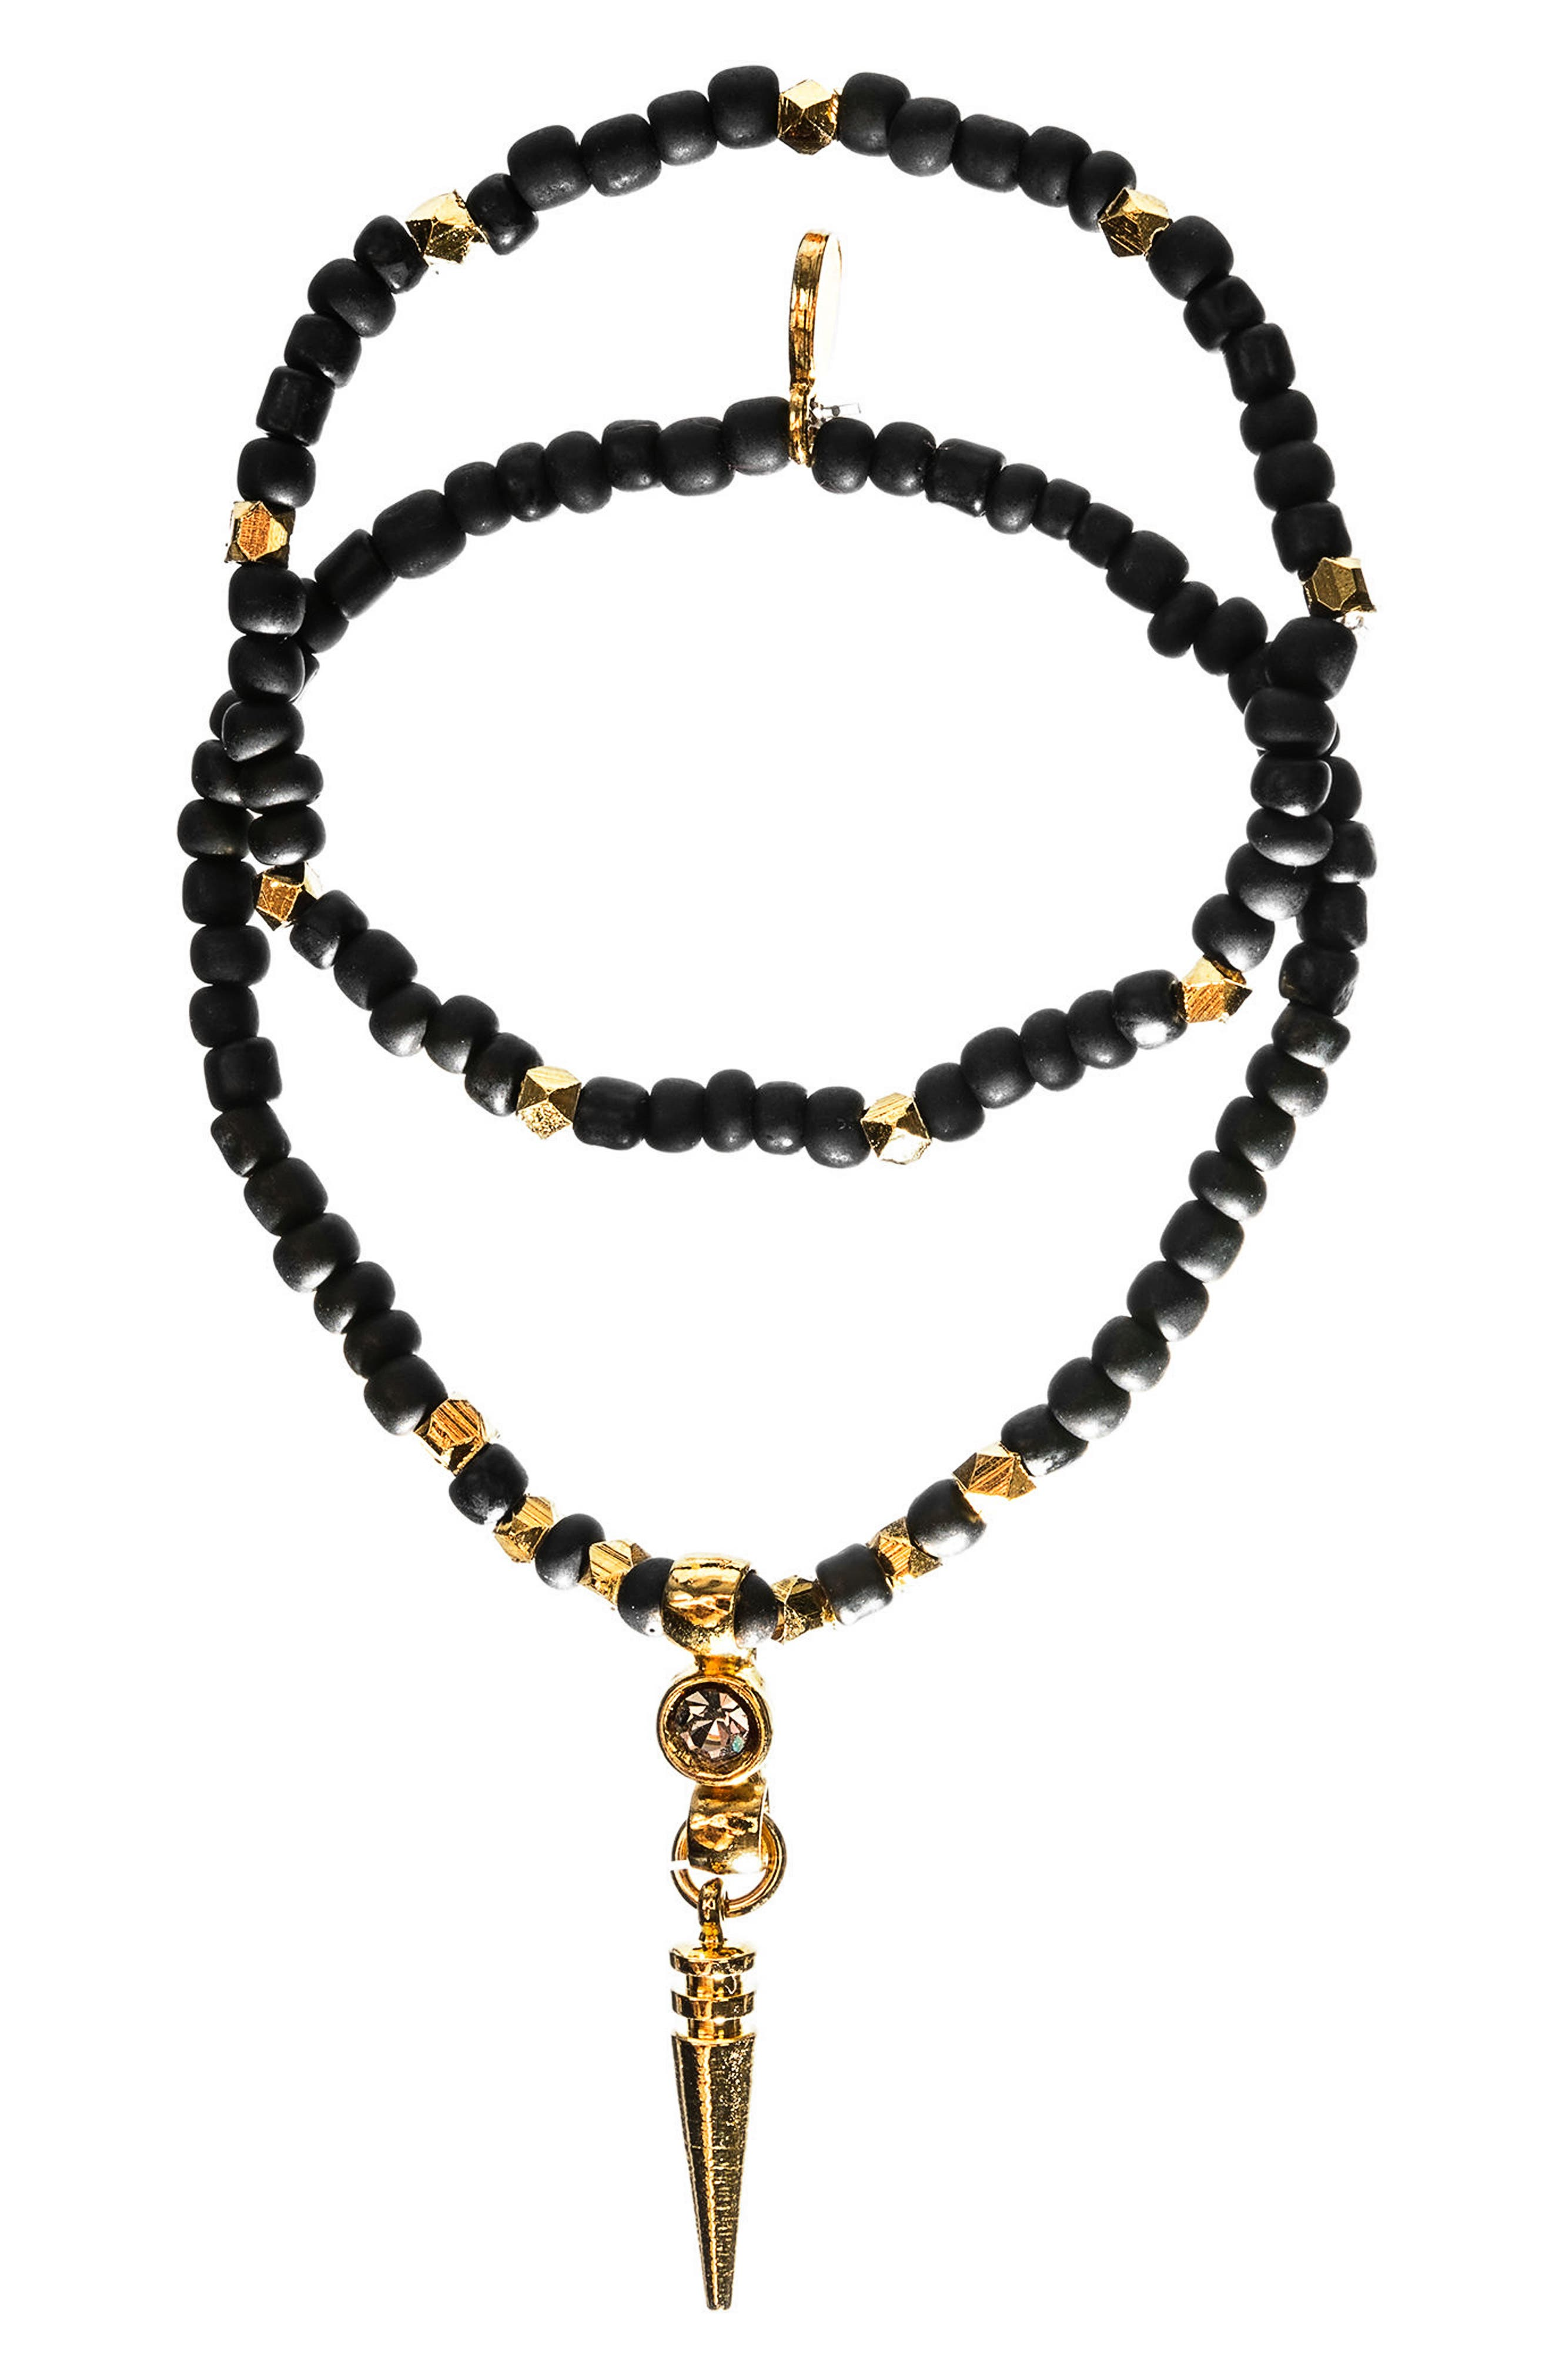 MHART Crystal Spike Set of 2 Beaded Stretch Bracelets